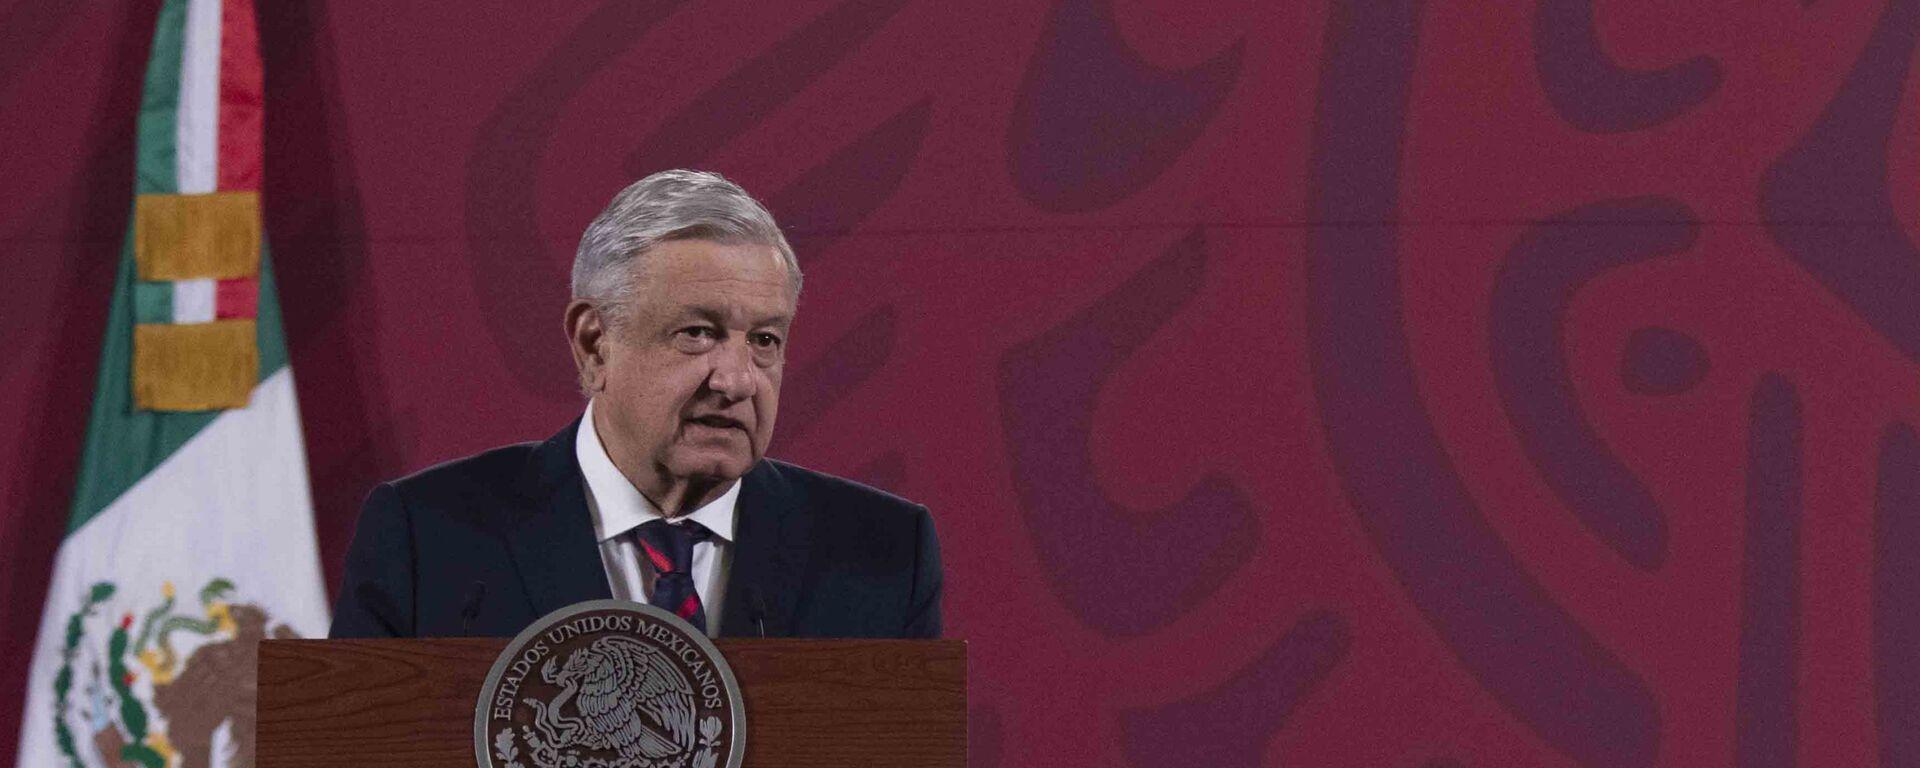 El presidente de México, Andrés Manuel López Obrador - Sputnik Mundo, 1920, 22.01.2021